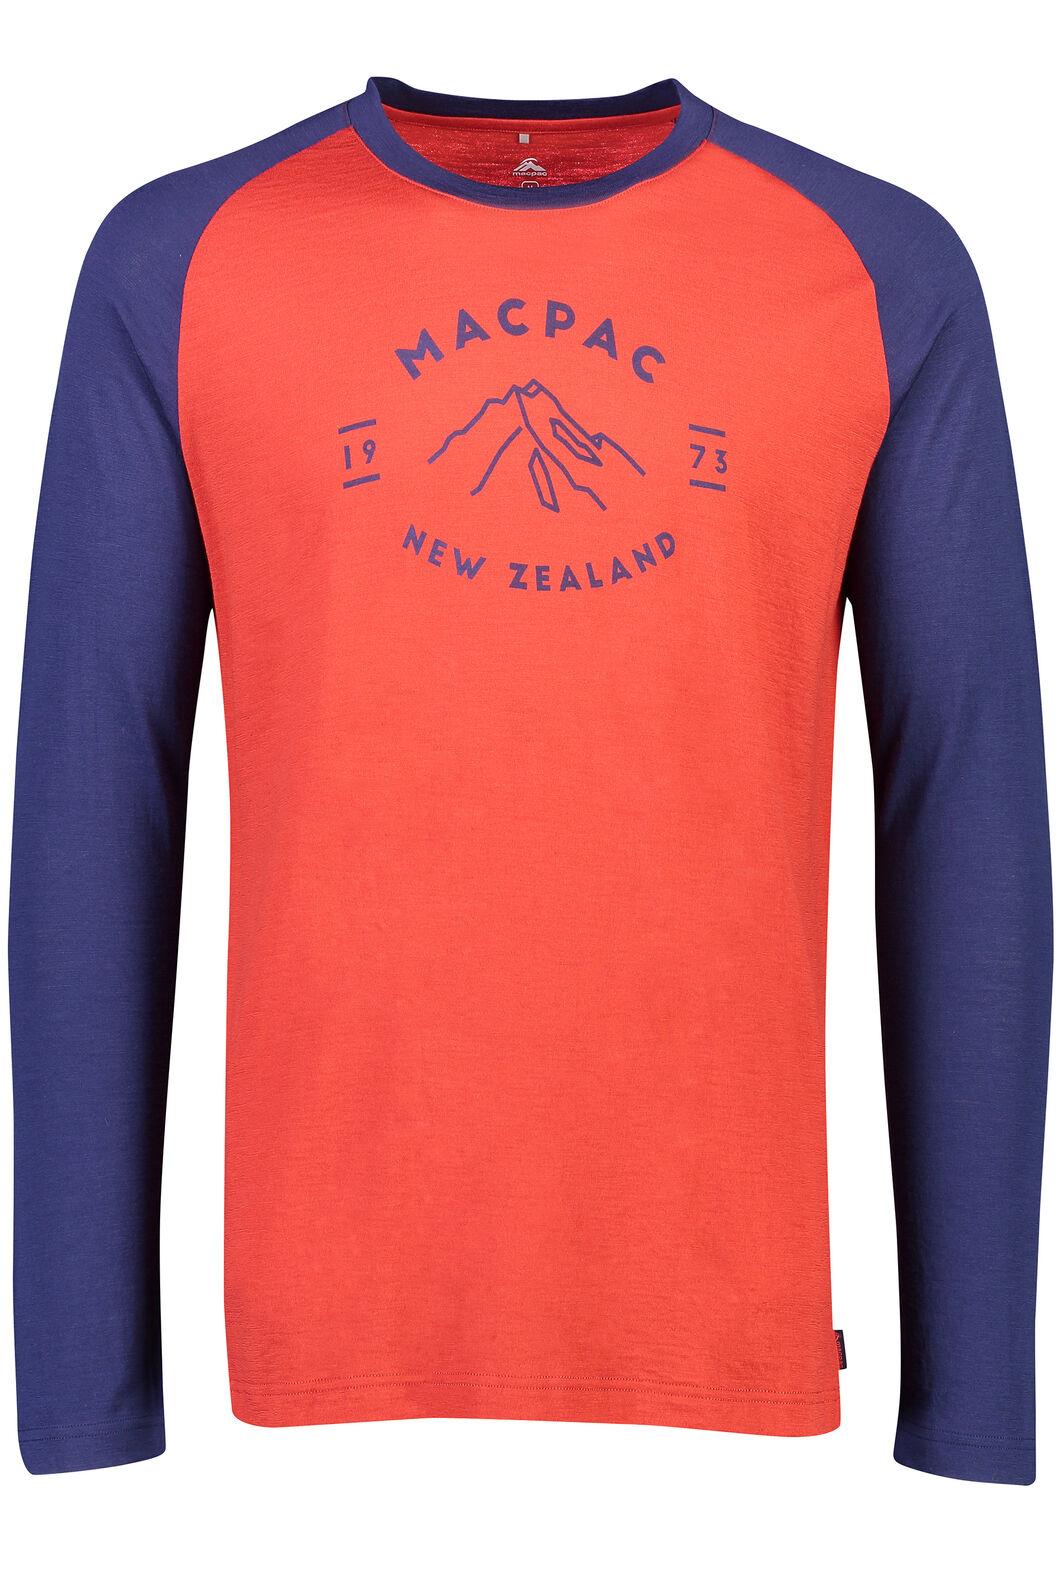 Macpac Mountain Merino 180 Long Sleeve Crew - Men's, Pompeian, hi-res